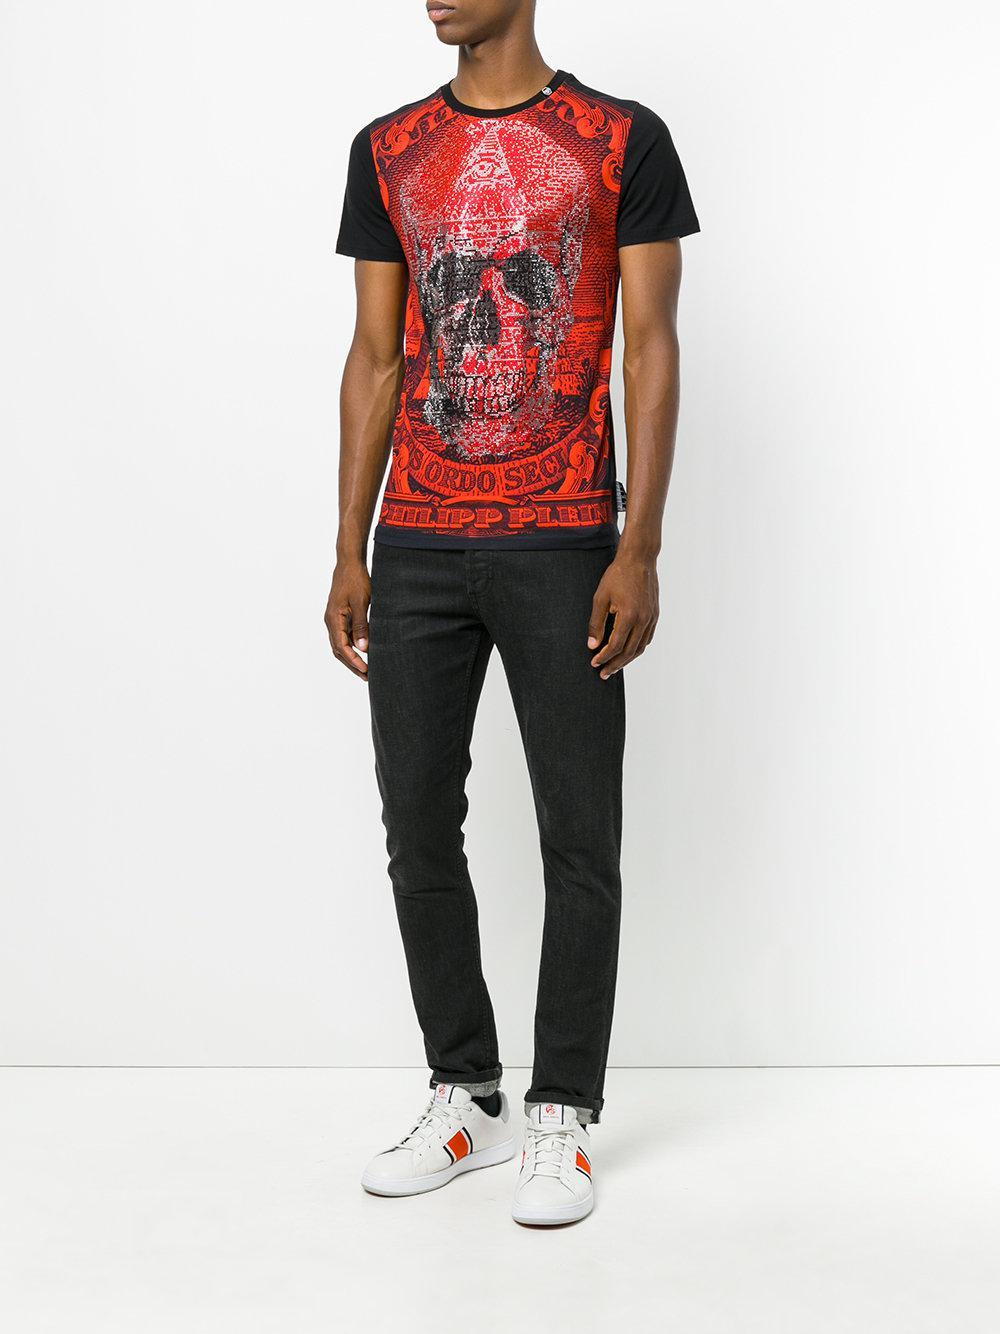 lyst philipp plein curtis t shirt in red for men. Black Bedroom Furniture Sets. Home Design Ideas